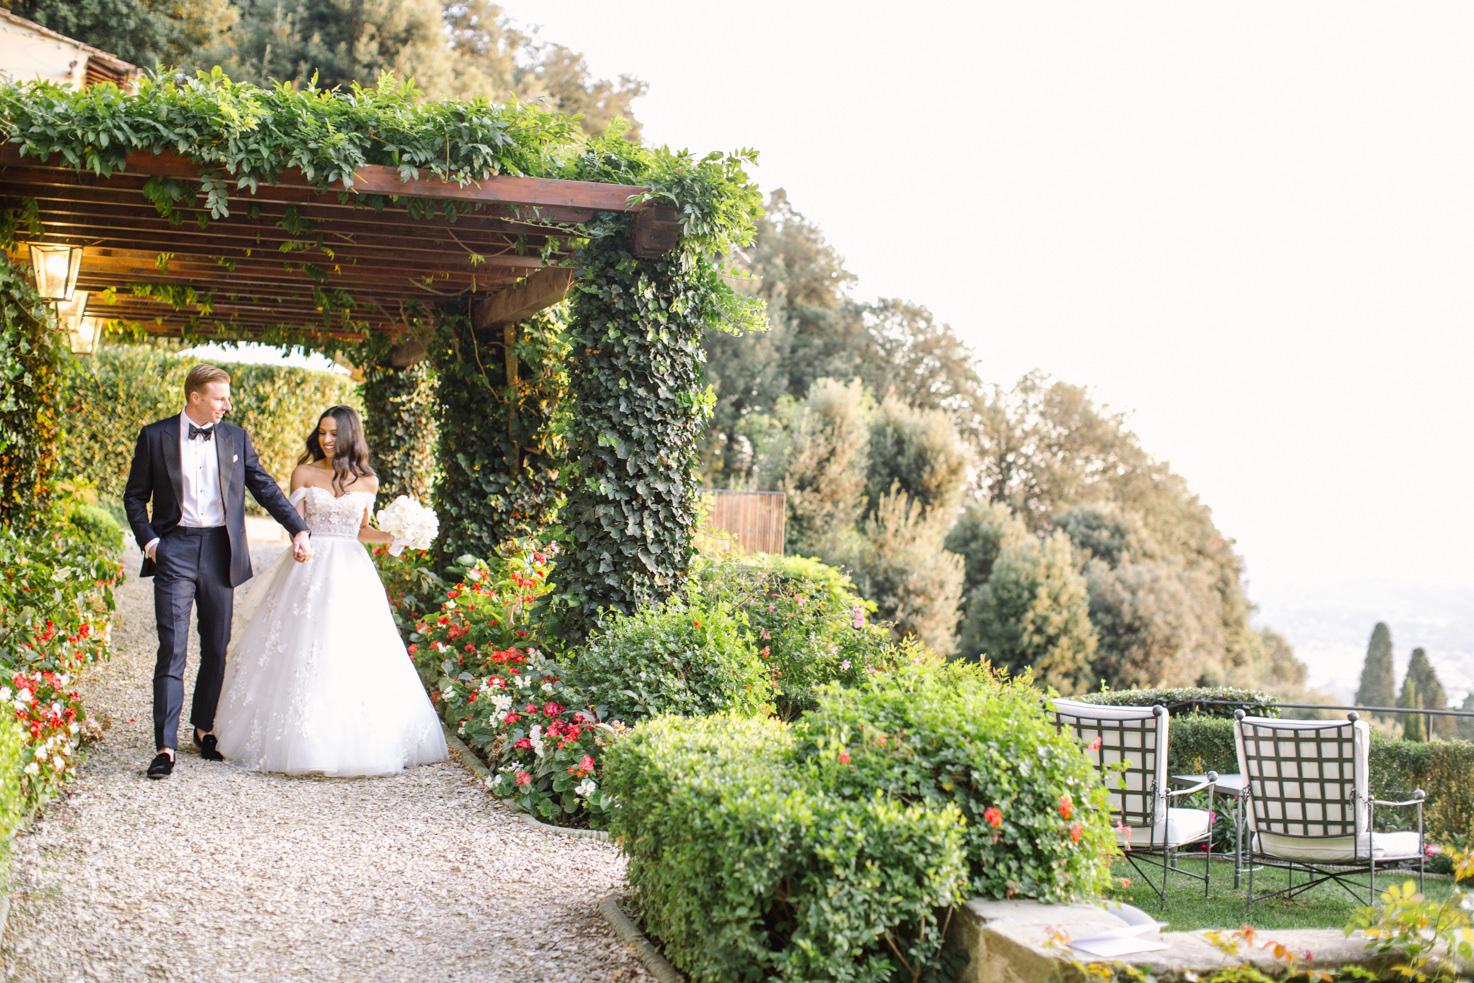 Bridal couple in the gardens of Villa San Michele